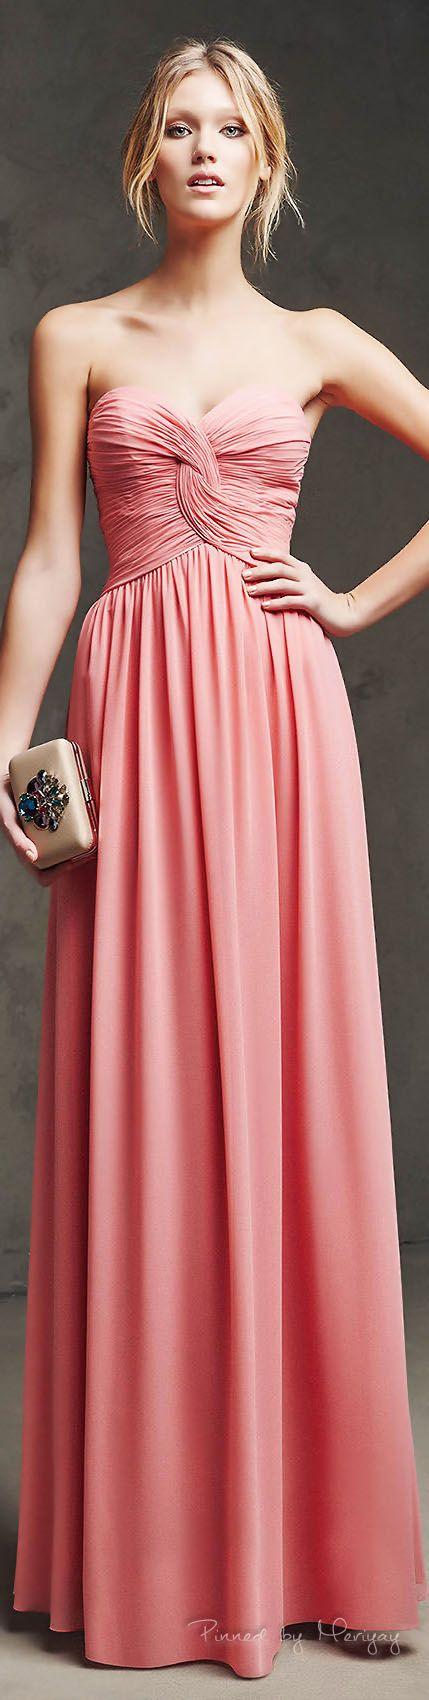 20 best Vestidos images on Pinterest   Long prom dresses ...